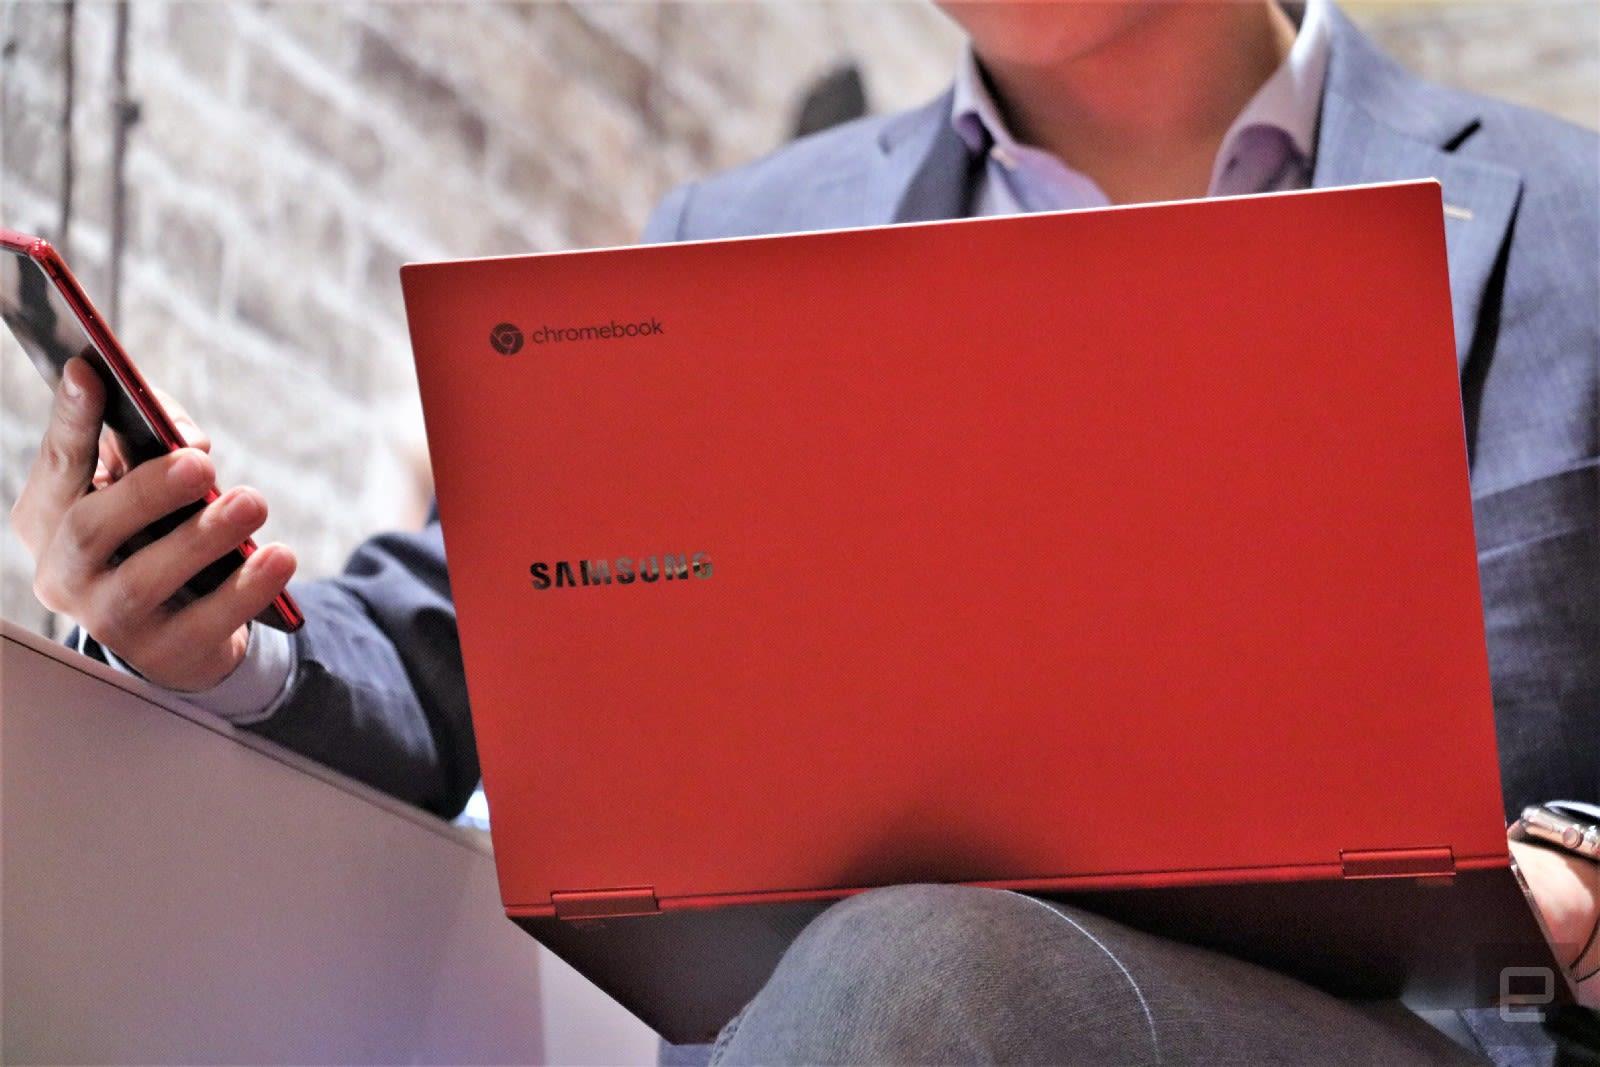 Samsung Galaxy Chromebook hands-on